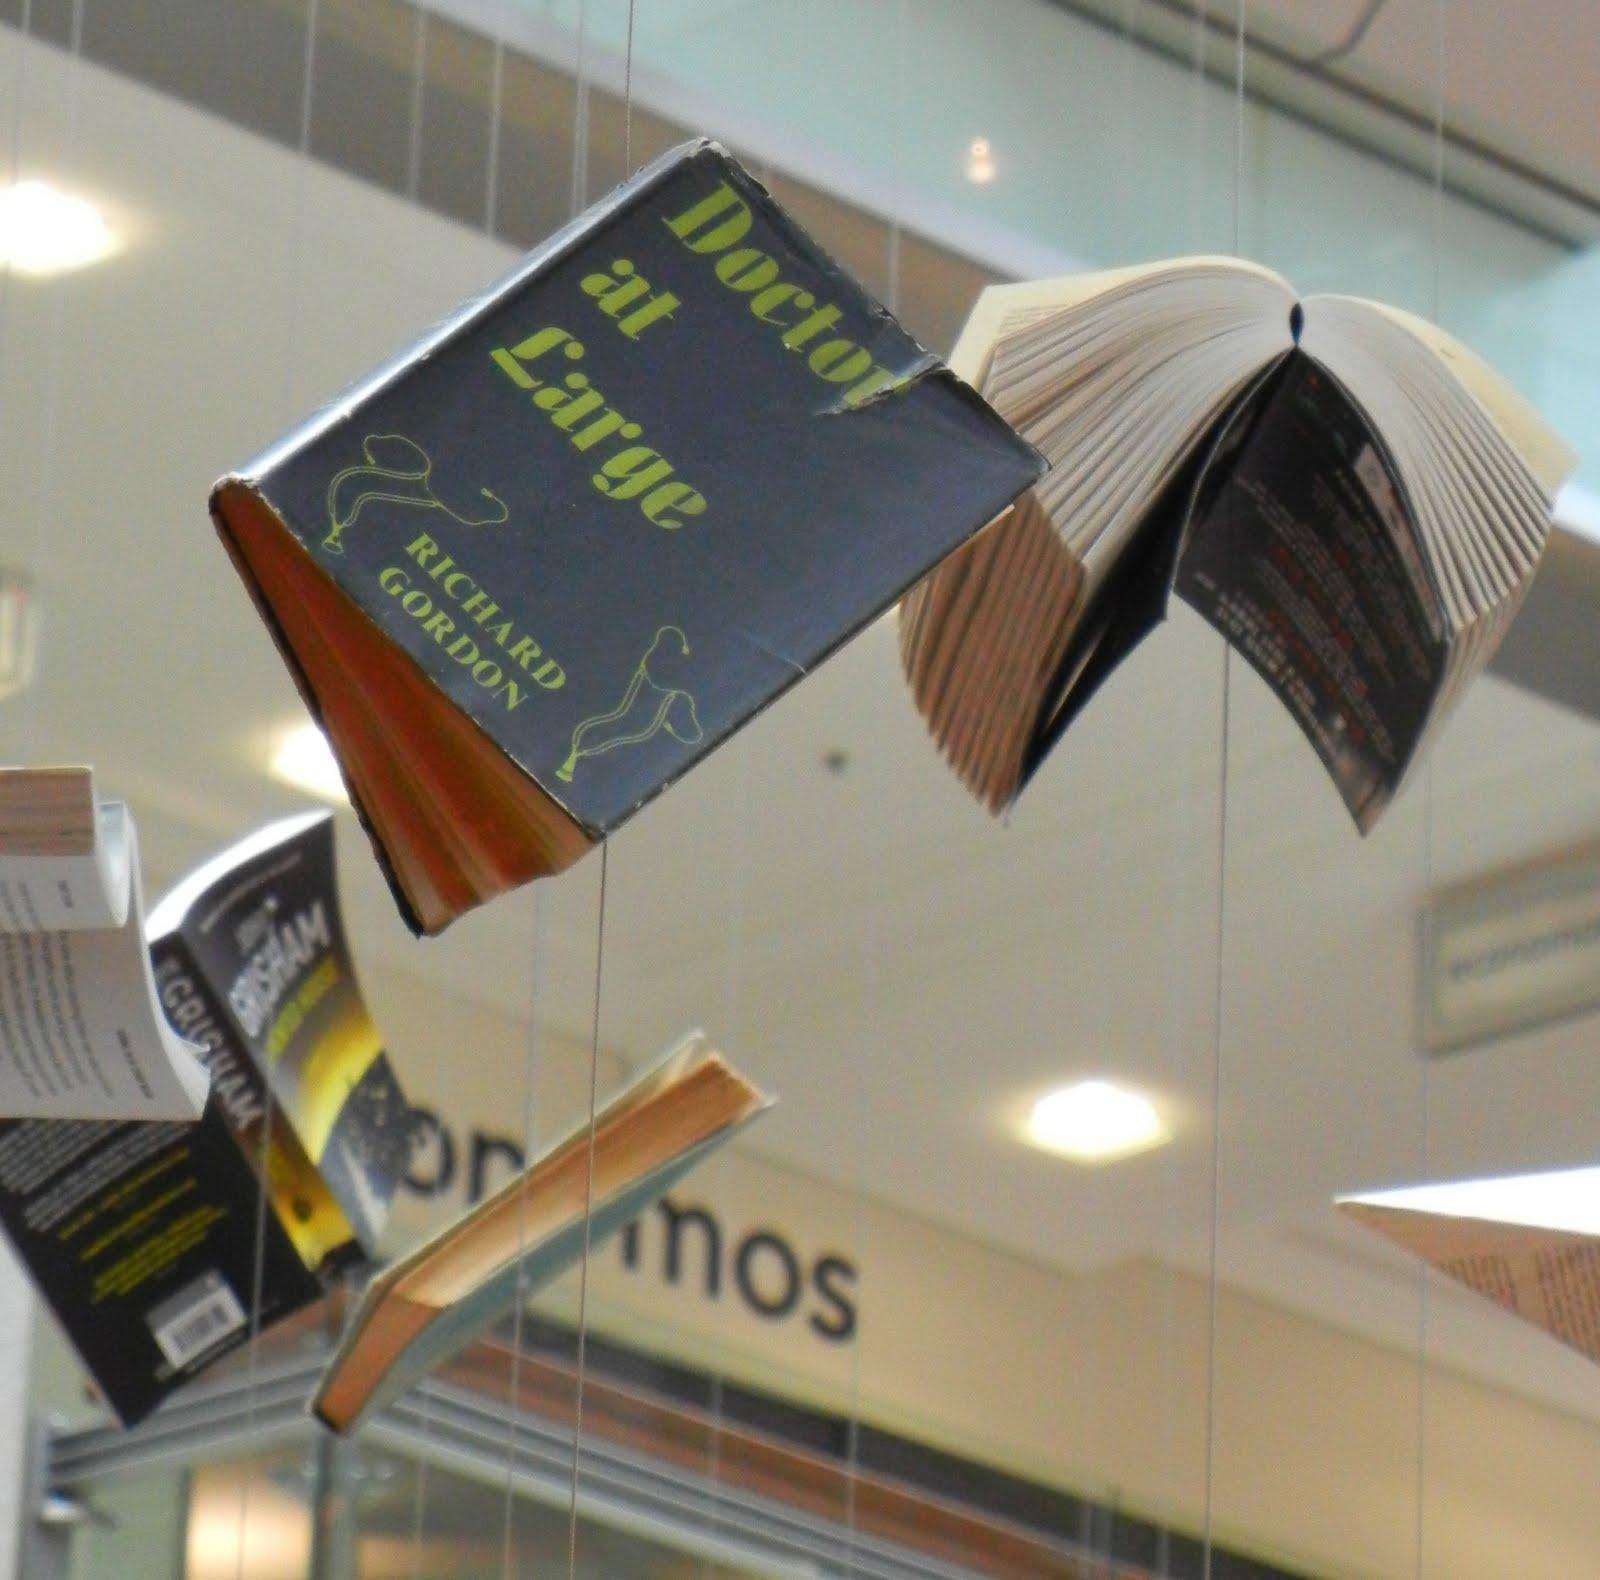 Sydney - Australia: Doctor at Large Flying Book